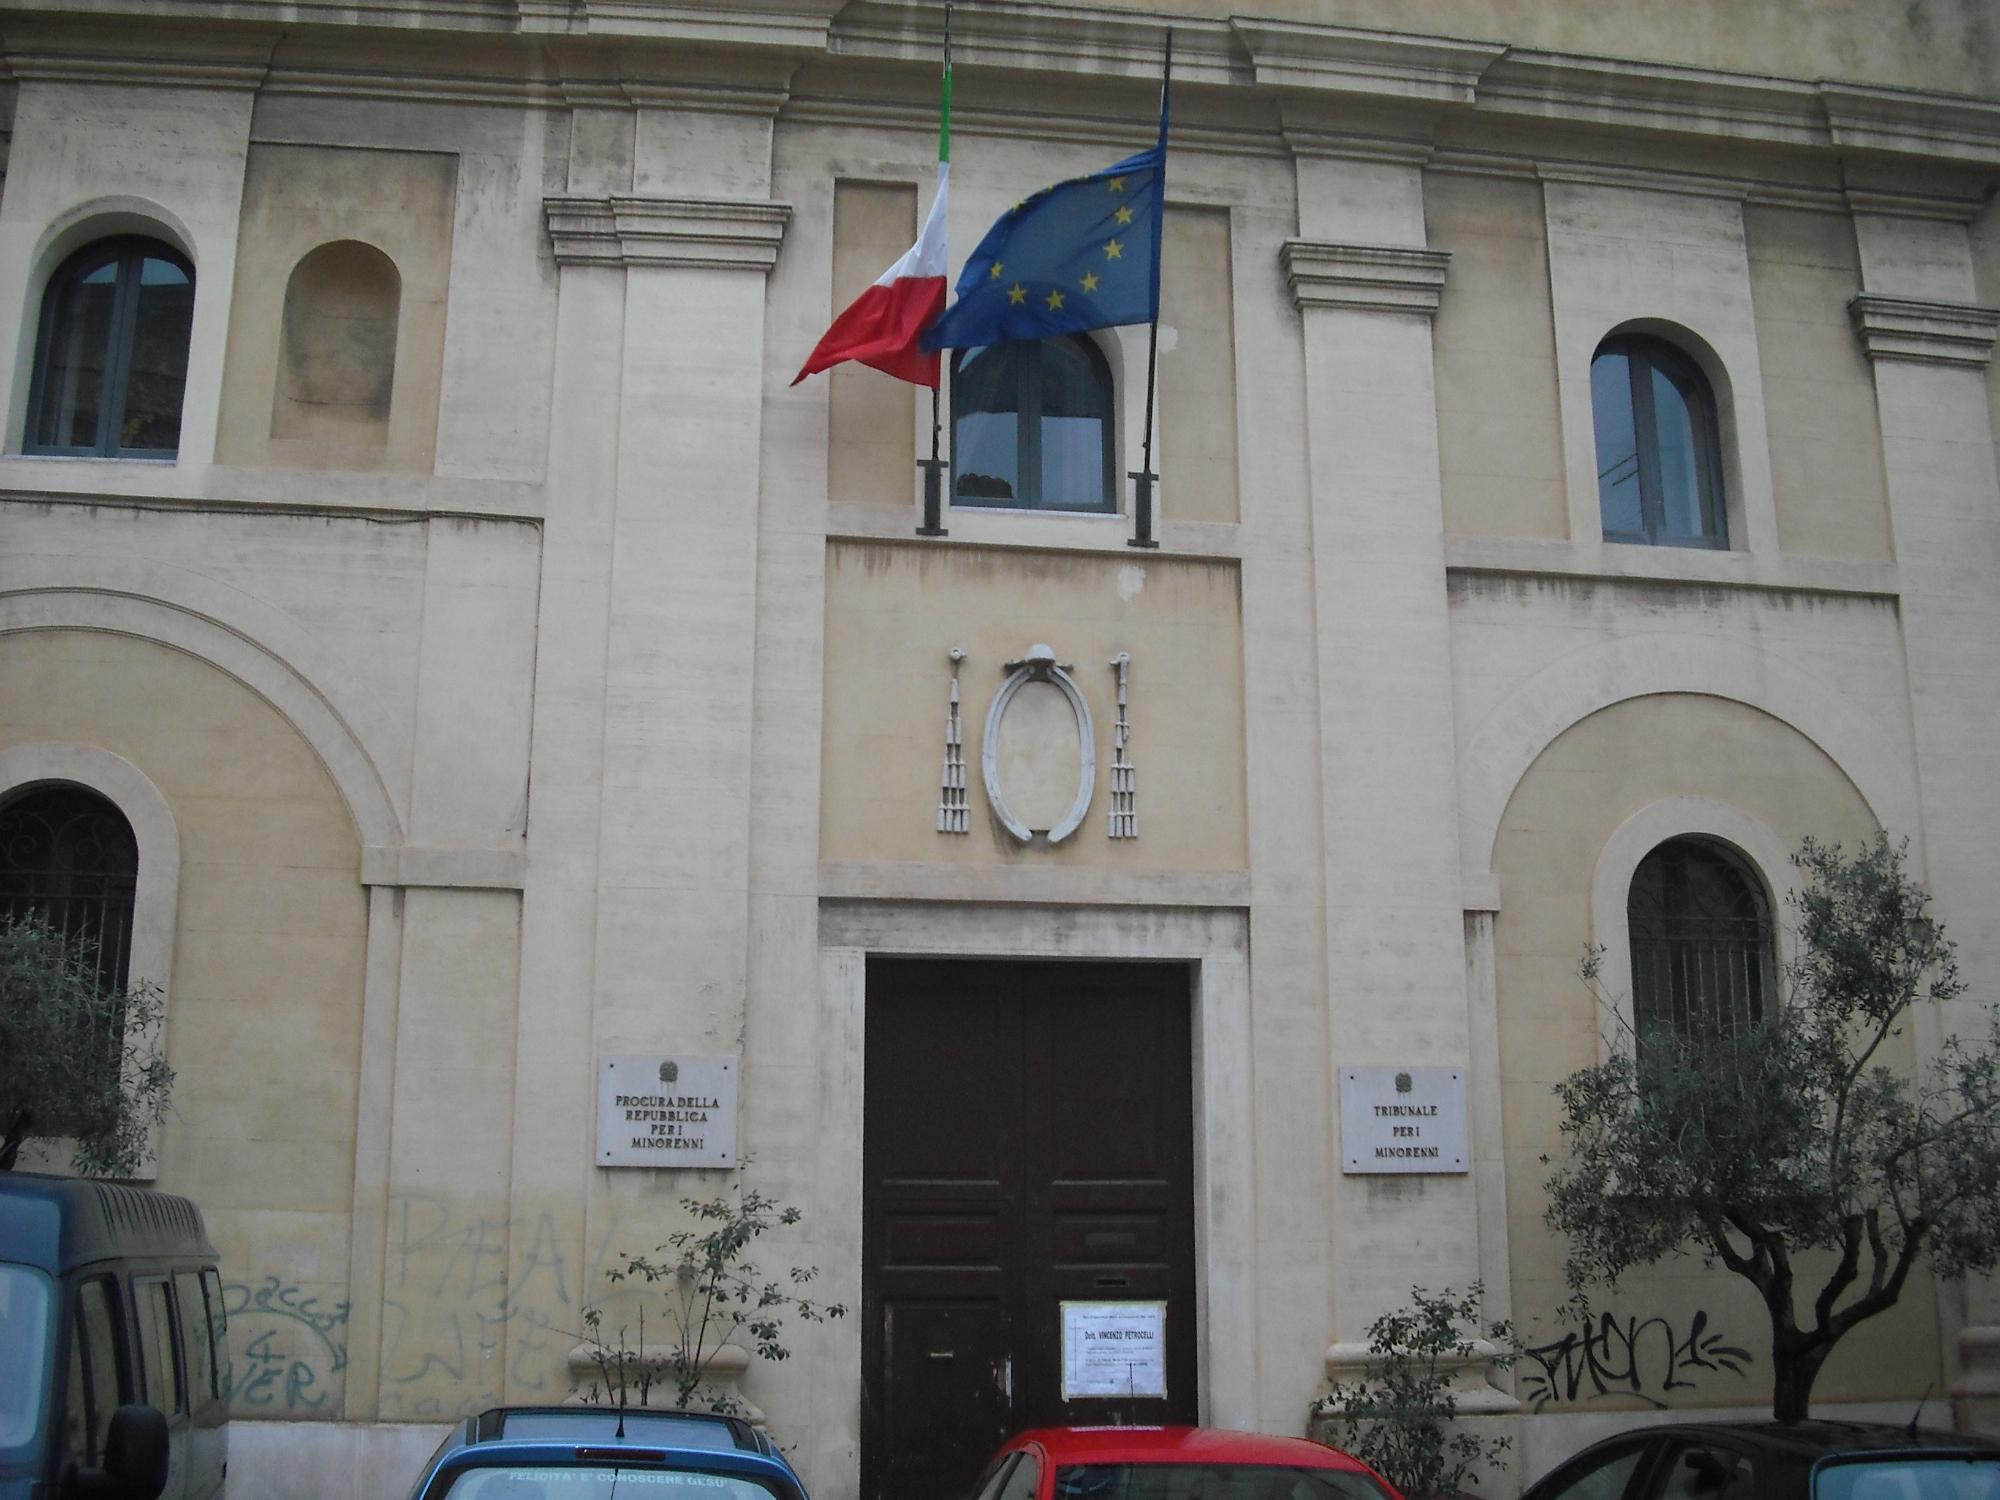 Convento Santa Chiara